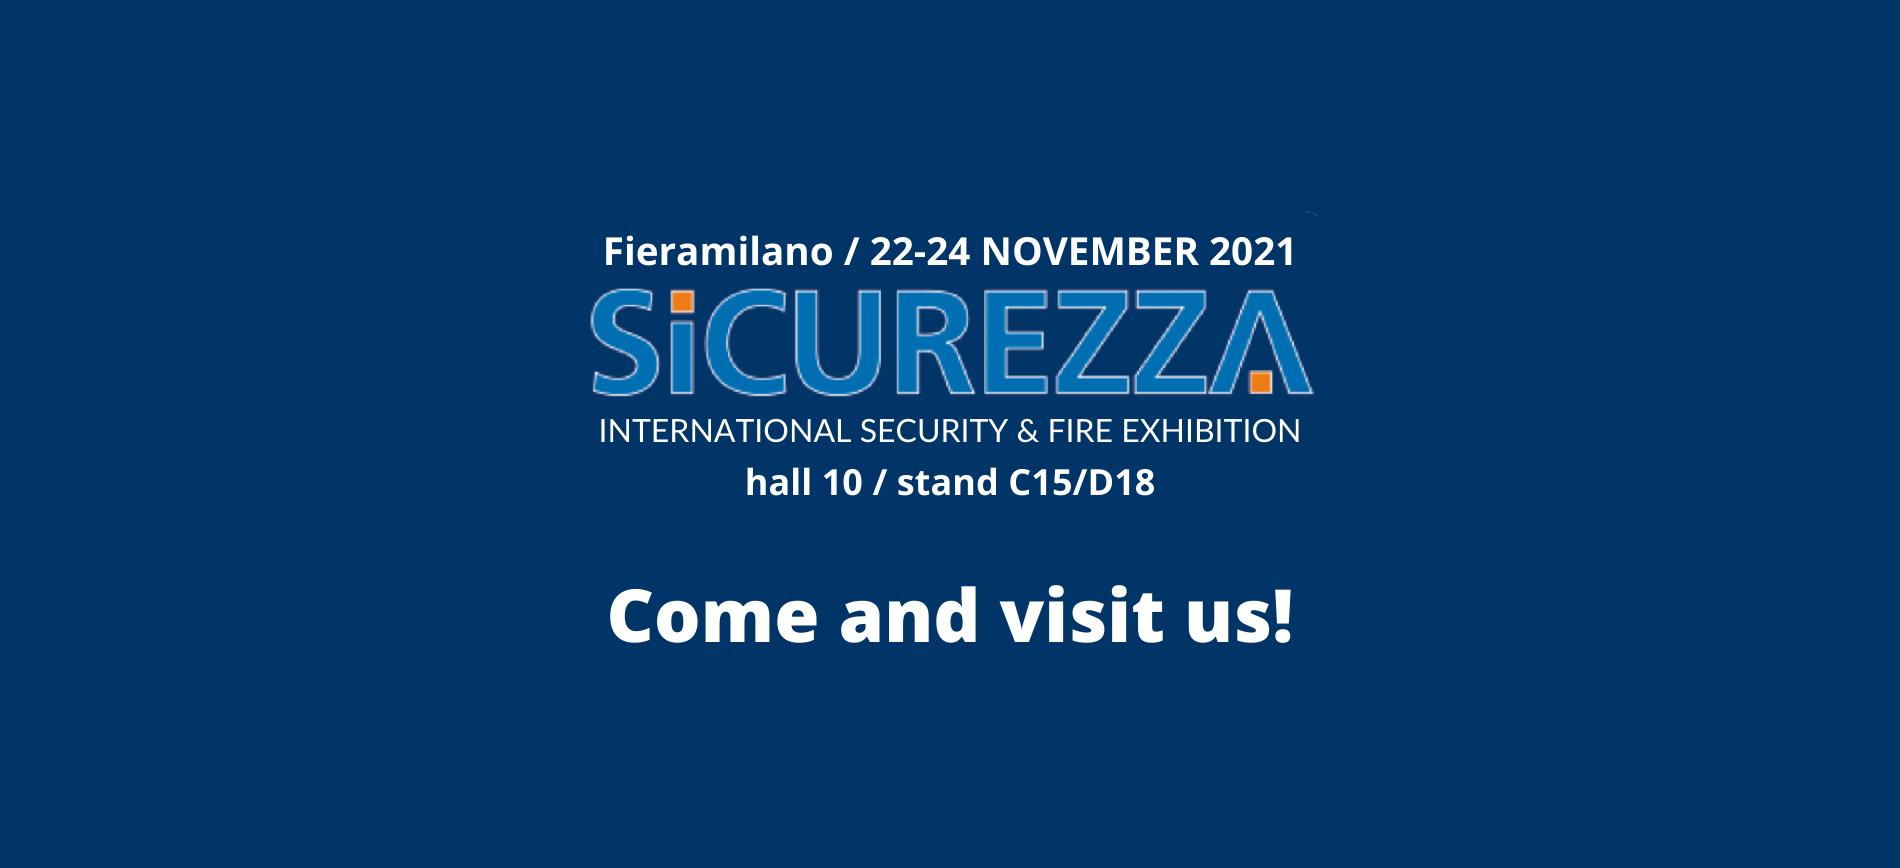 Come and visit us to FIERA SICUREZZA!